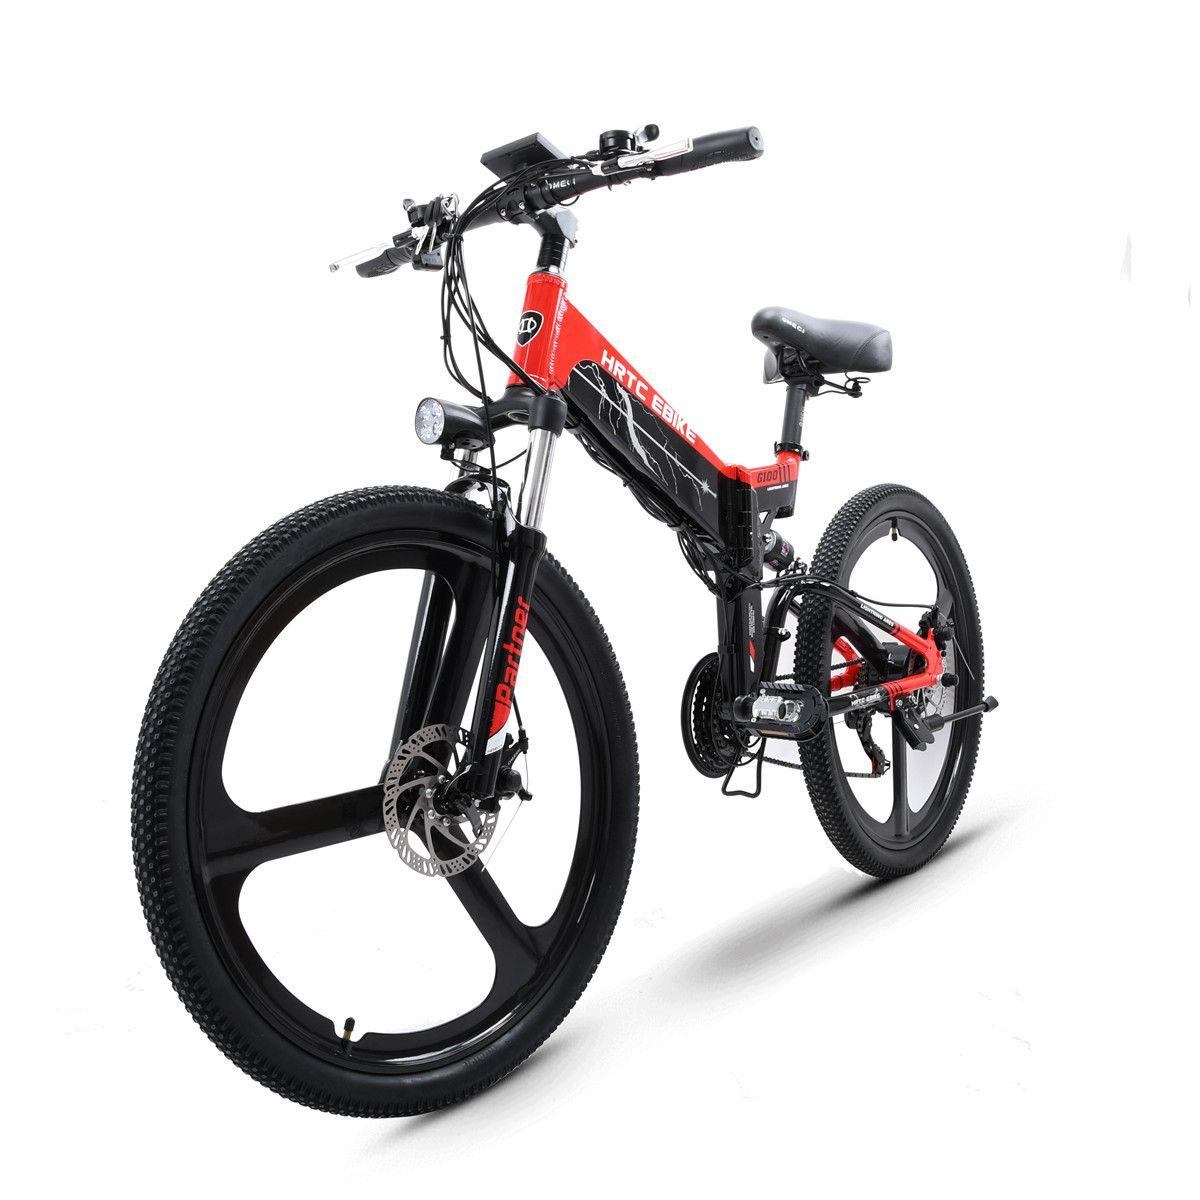 26 zoll falten elektro mountainbike 48V 400W hoher geschwindigkeit ebike Abnehmbare lithium-batterie Reise unterstützt elektro-bike